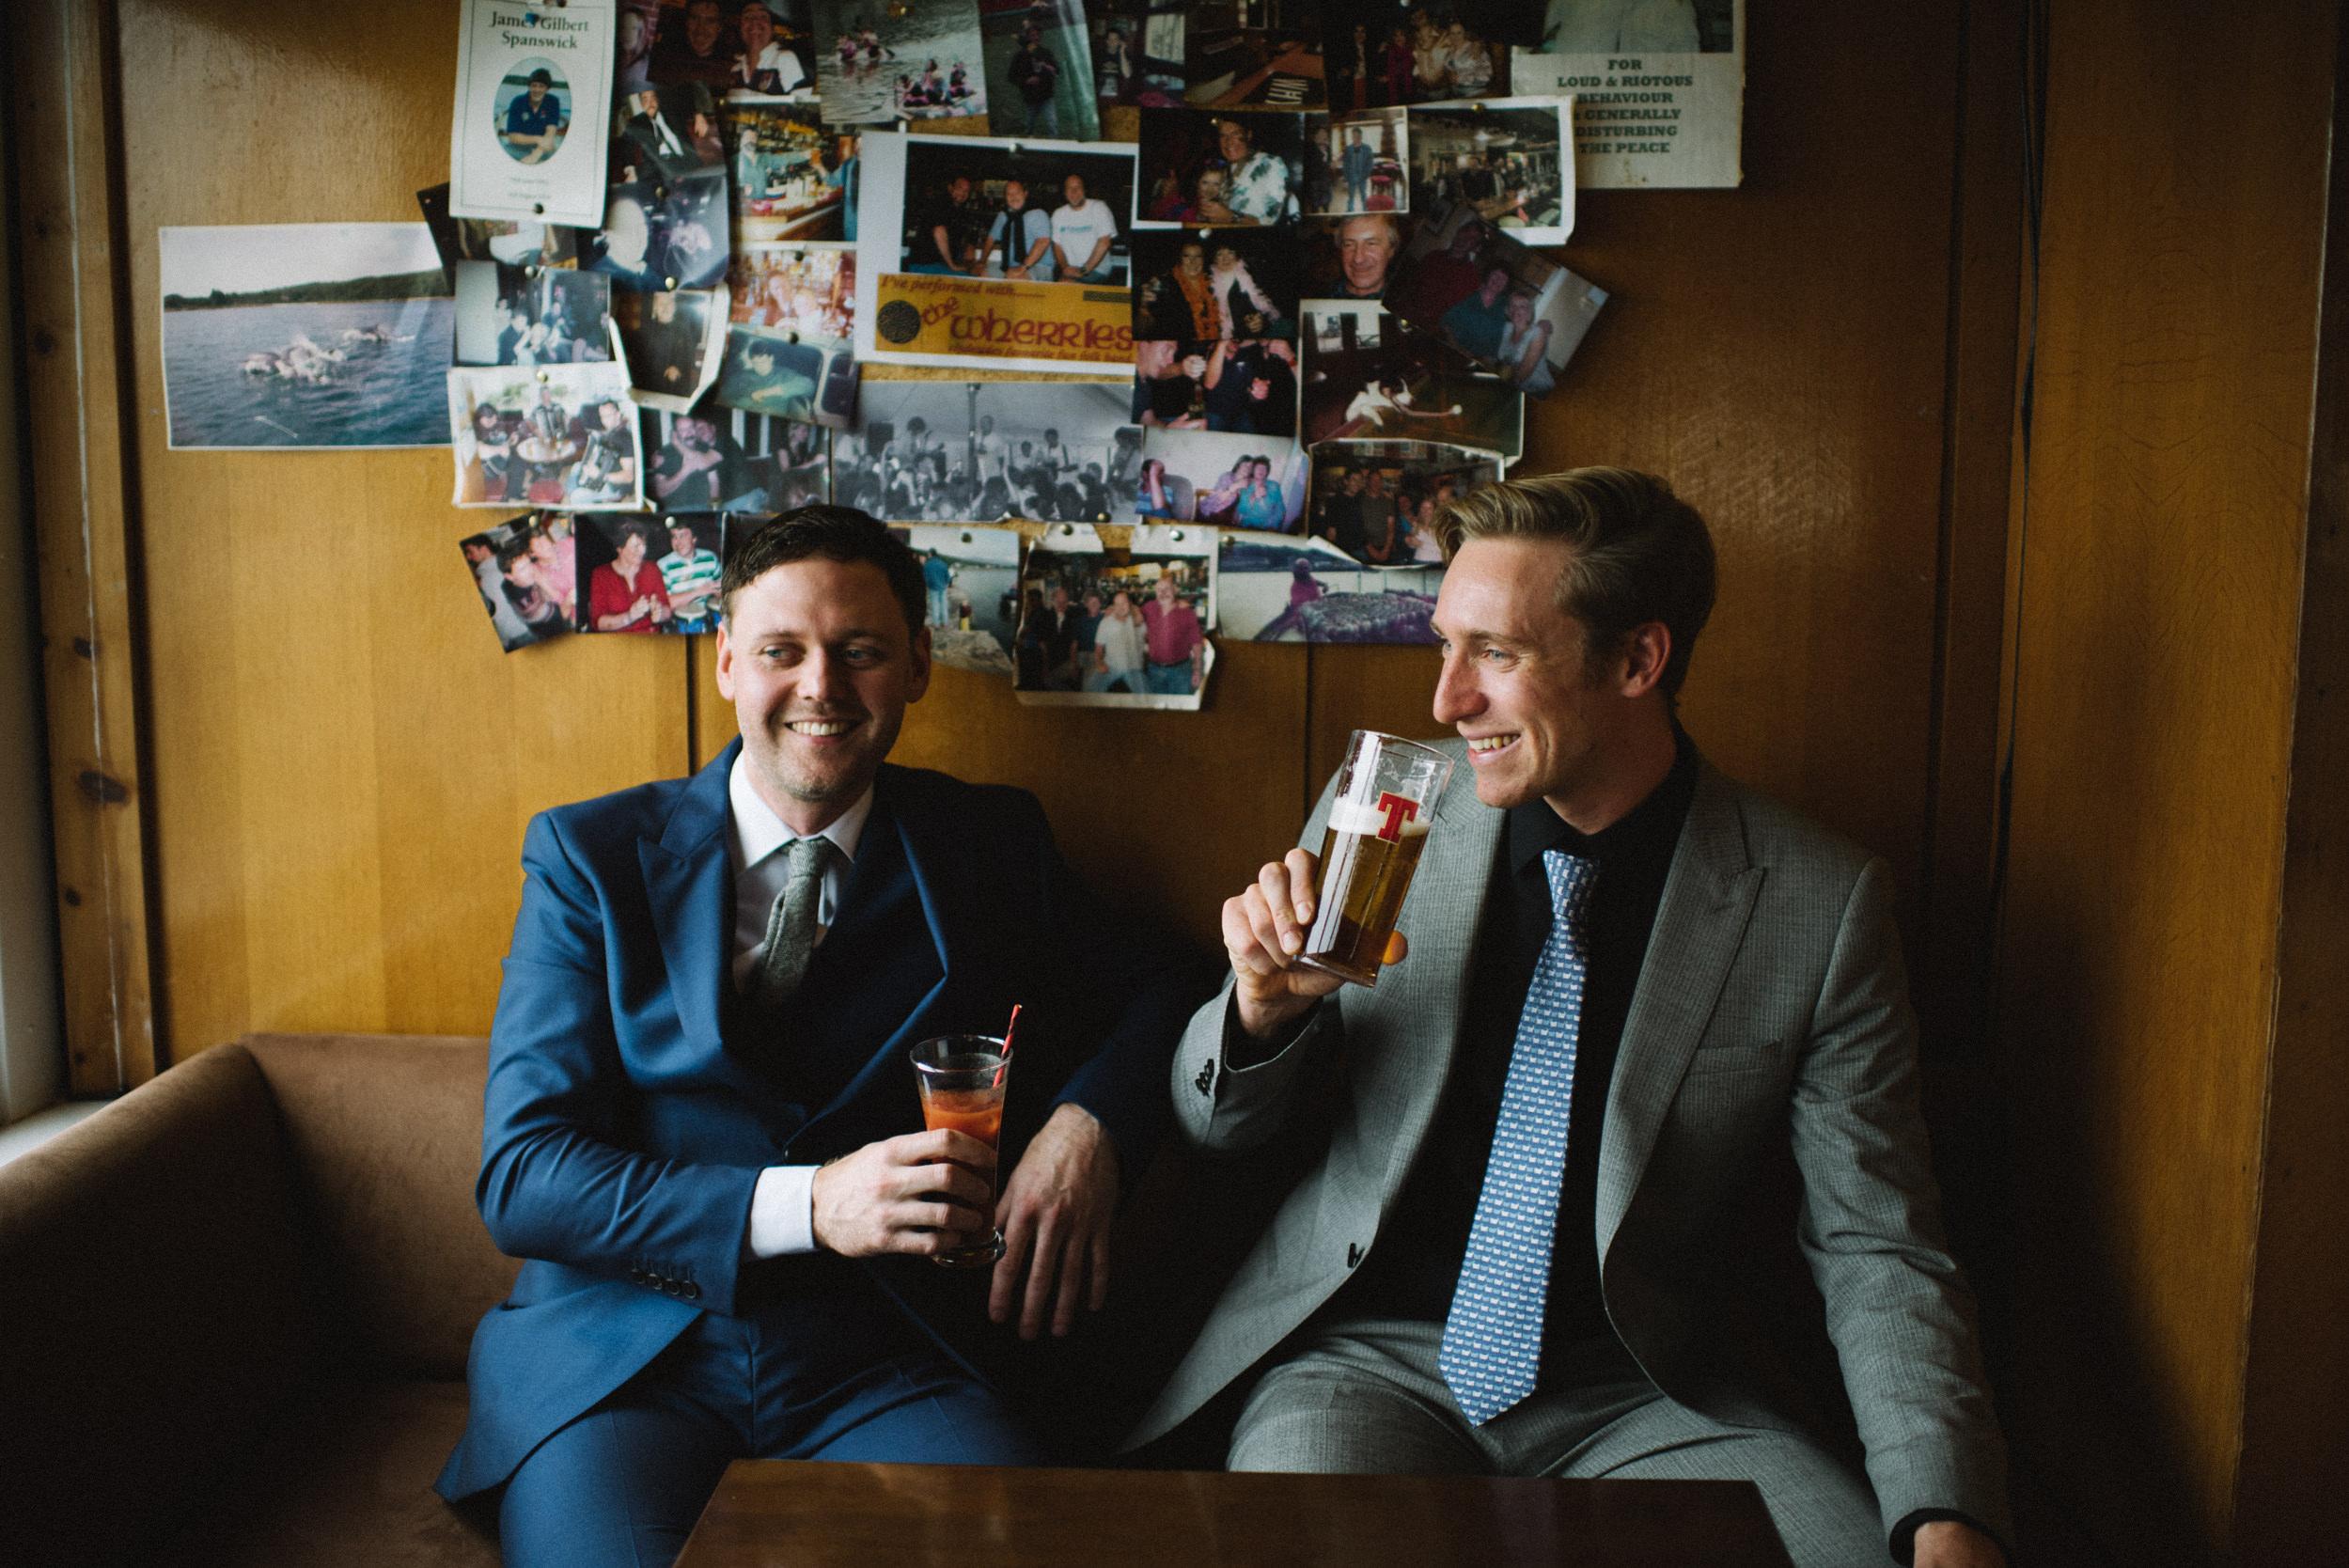 0081-alternative-wedding-portrait-family-kids-photographer-glasgow-scotland.JPG